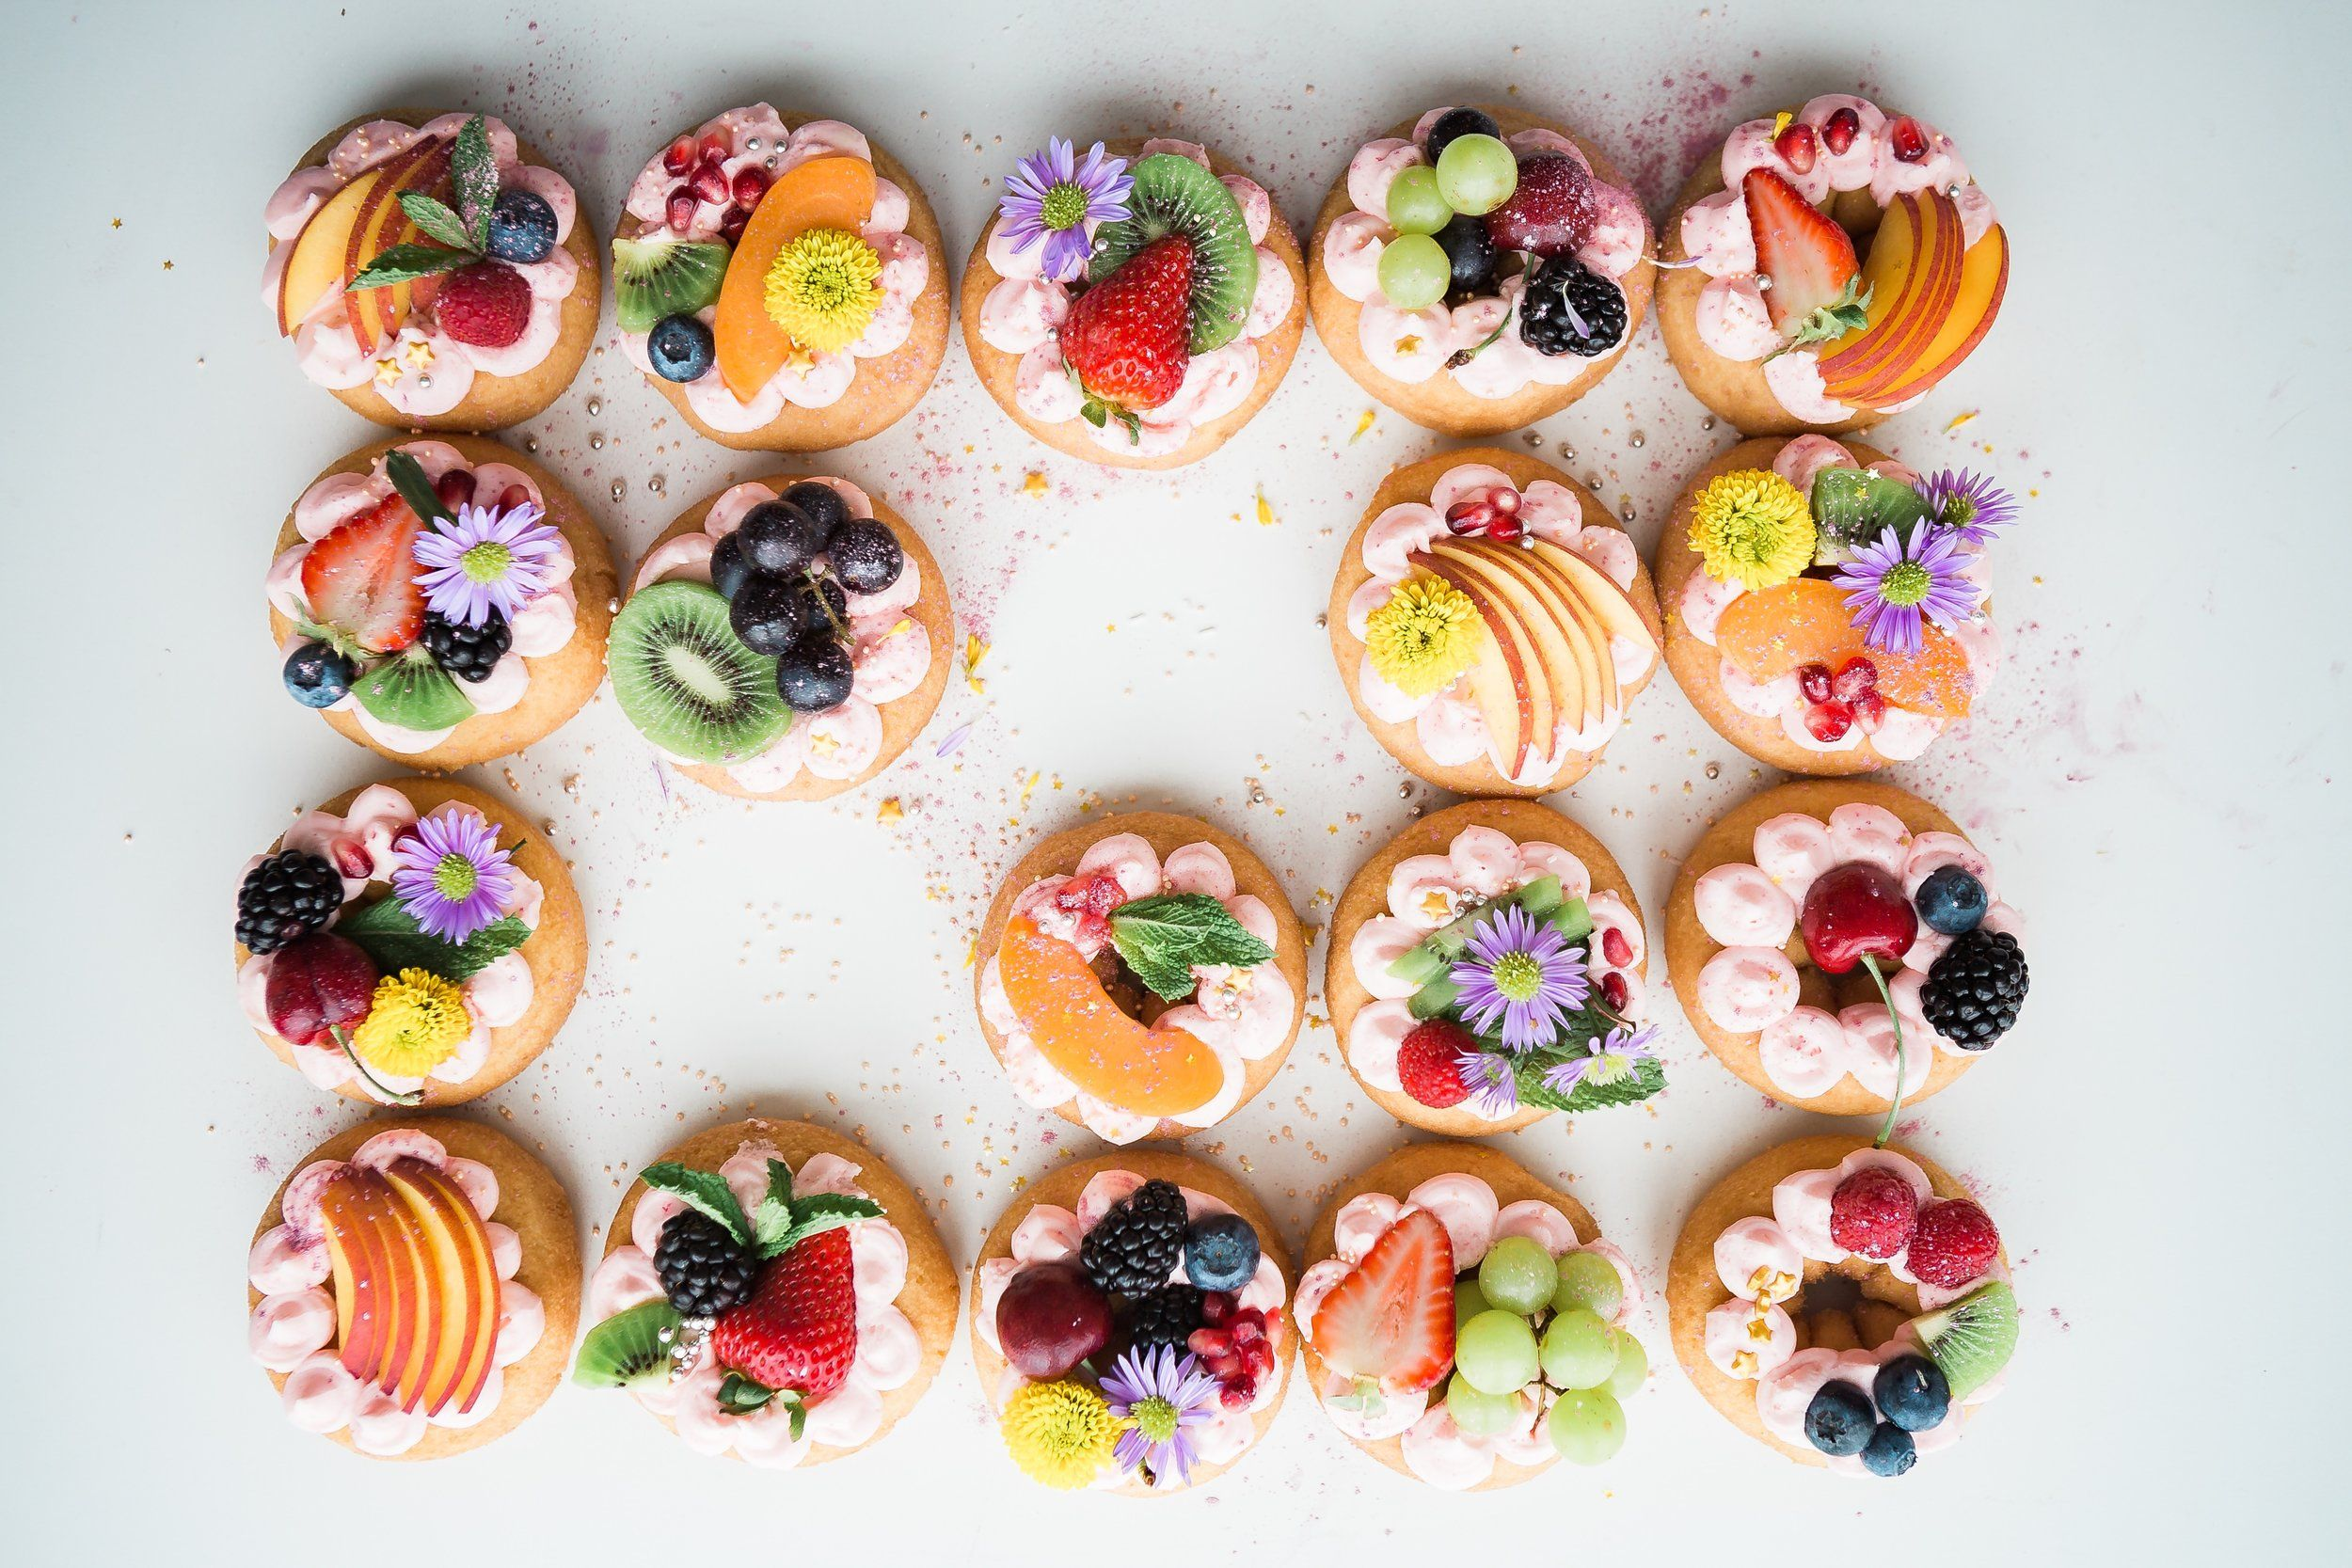 Eireneday Colorful Desserts Food Desserts